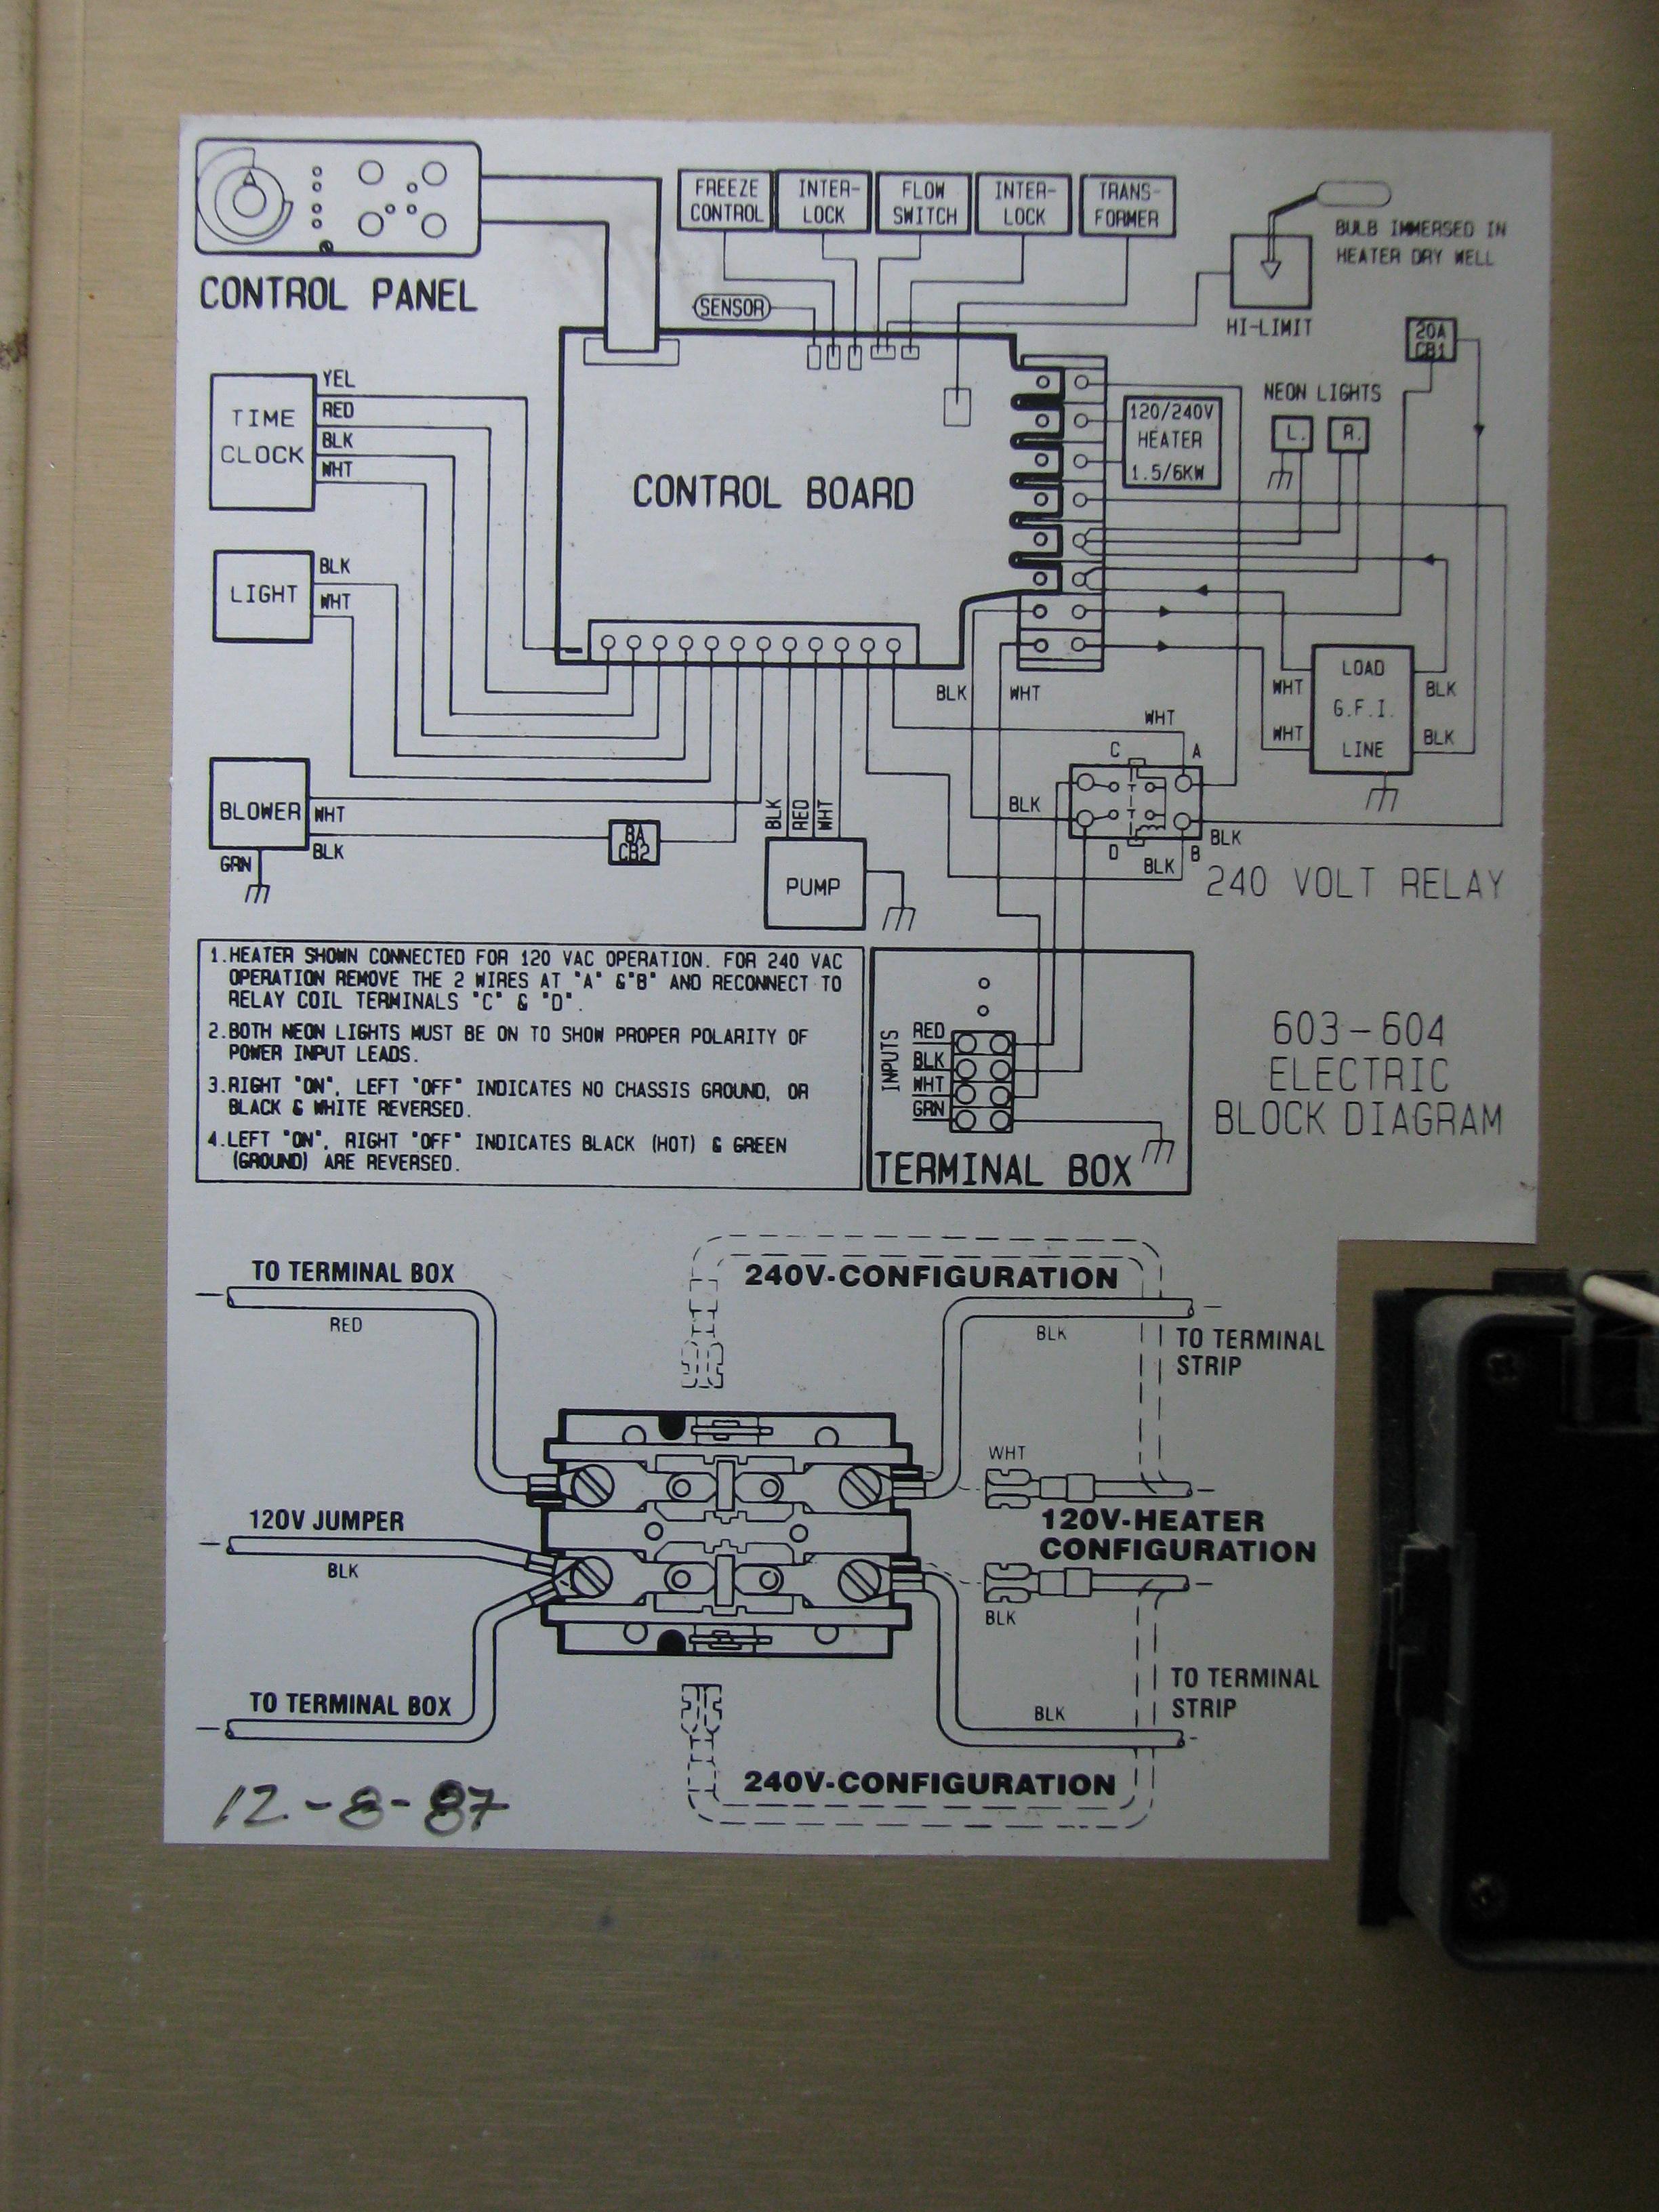 Luxury La Spas Wiring Diagram Inspiration - Electrical Diagram Ideas ...